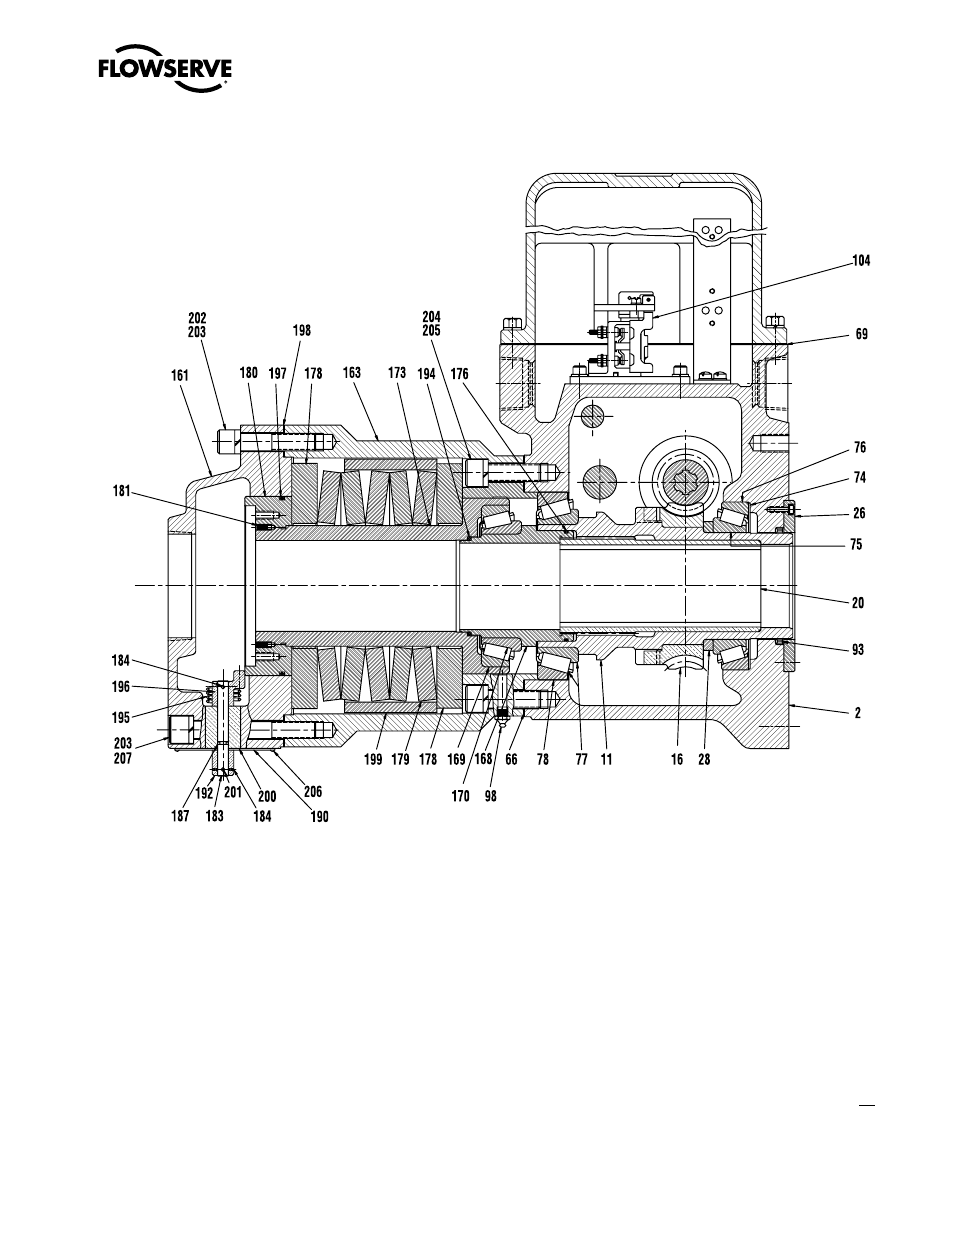 Flowserve Actuator Parts Diagram Detailed Wiring Diagrams Limitorque Smb 000 Series Electric Actuators User Manual Page 93 106